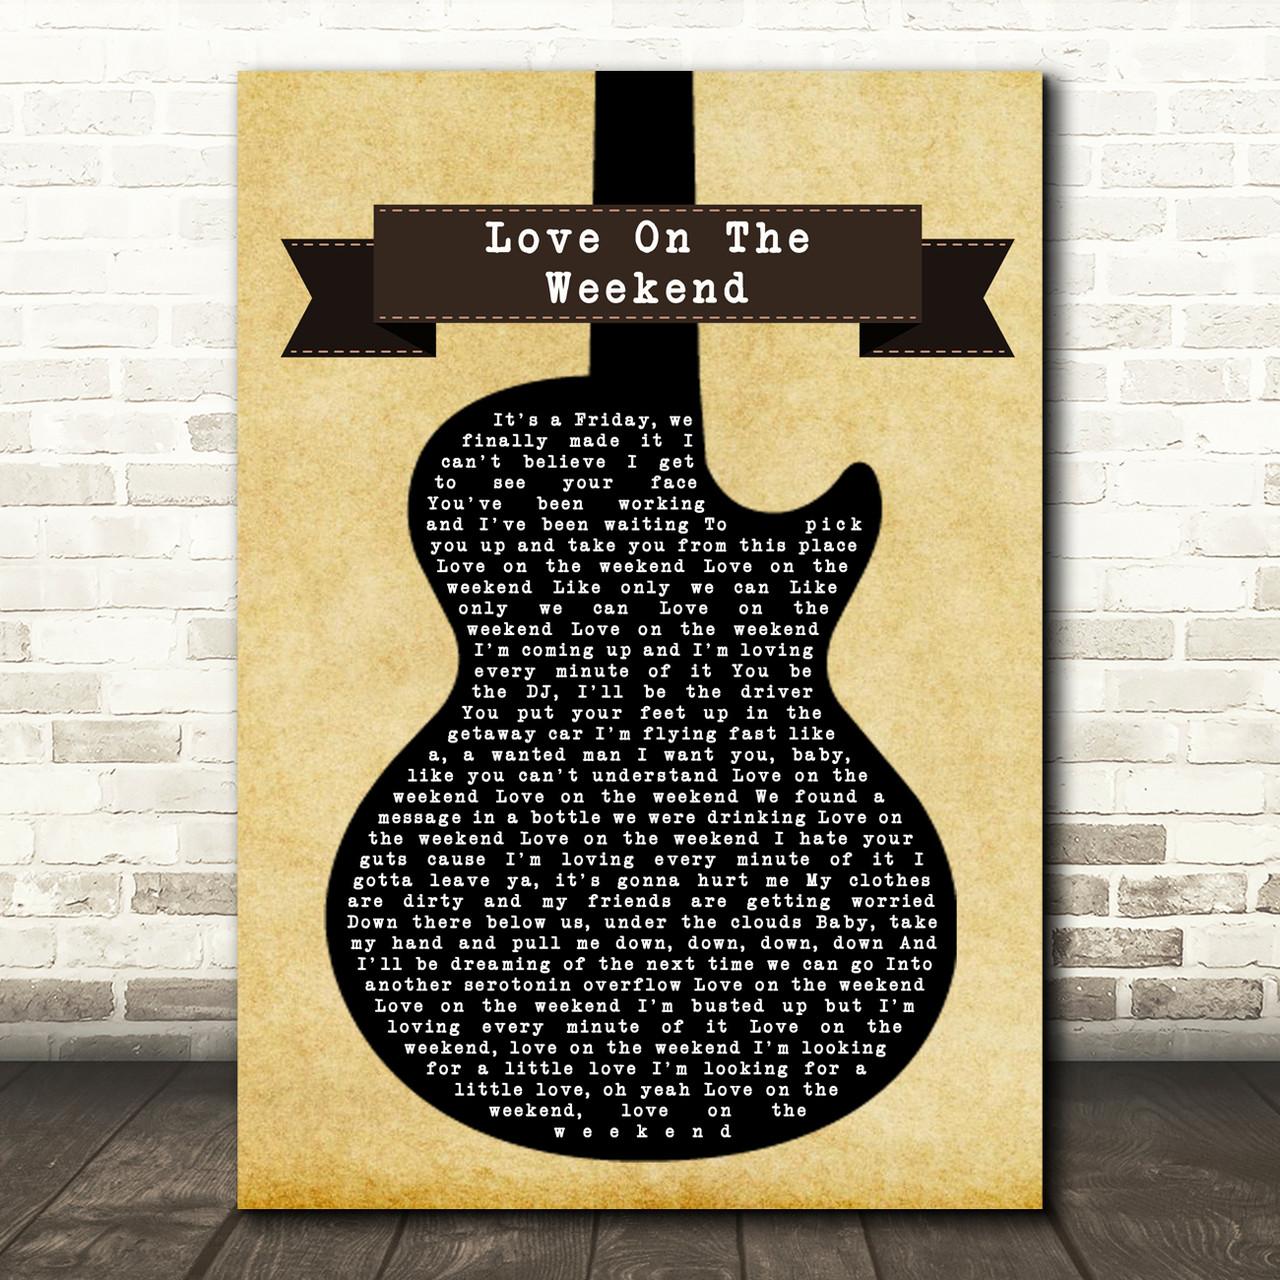 John Mayer Love on the Weekend Lyrics Poster LARGE FORMAT SIZES